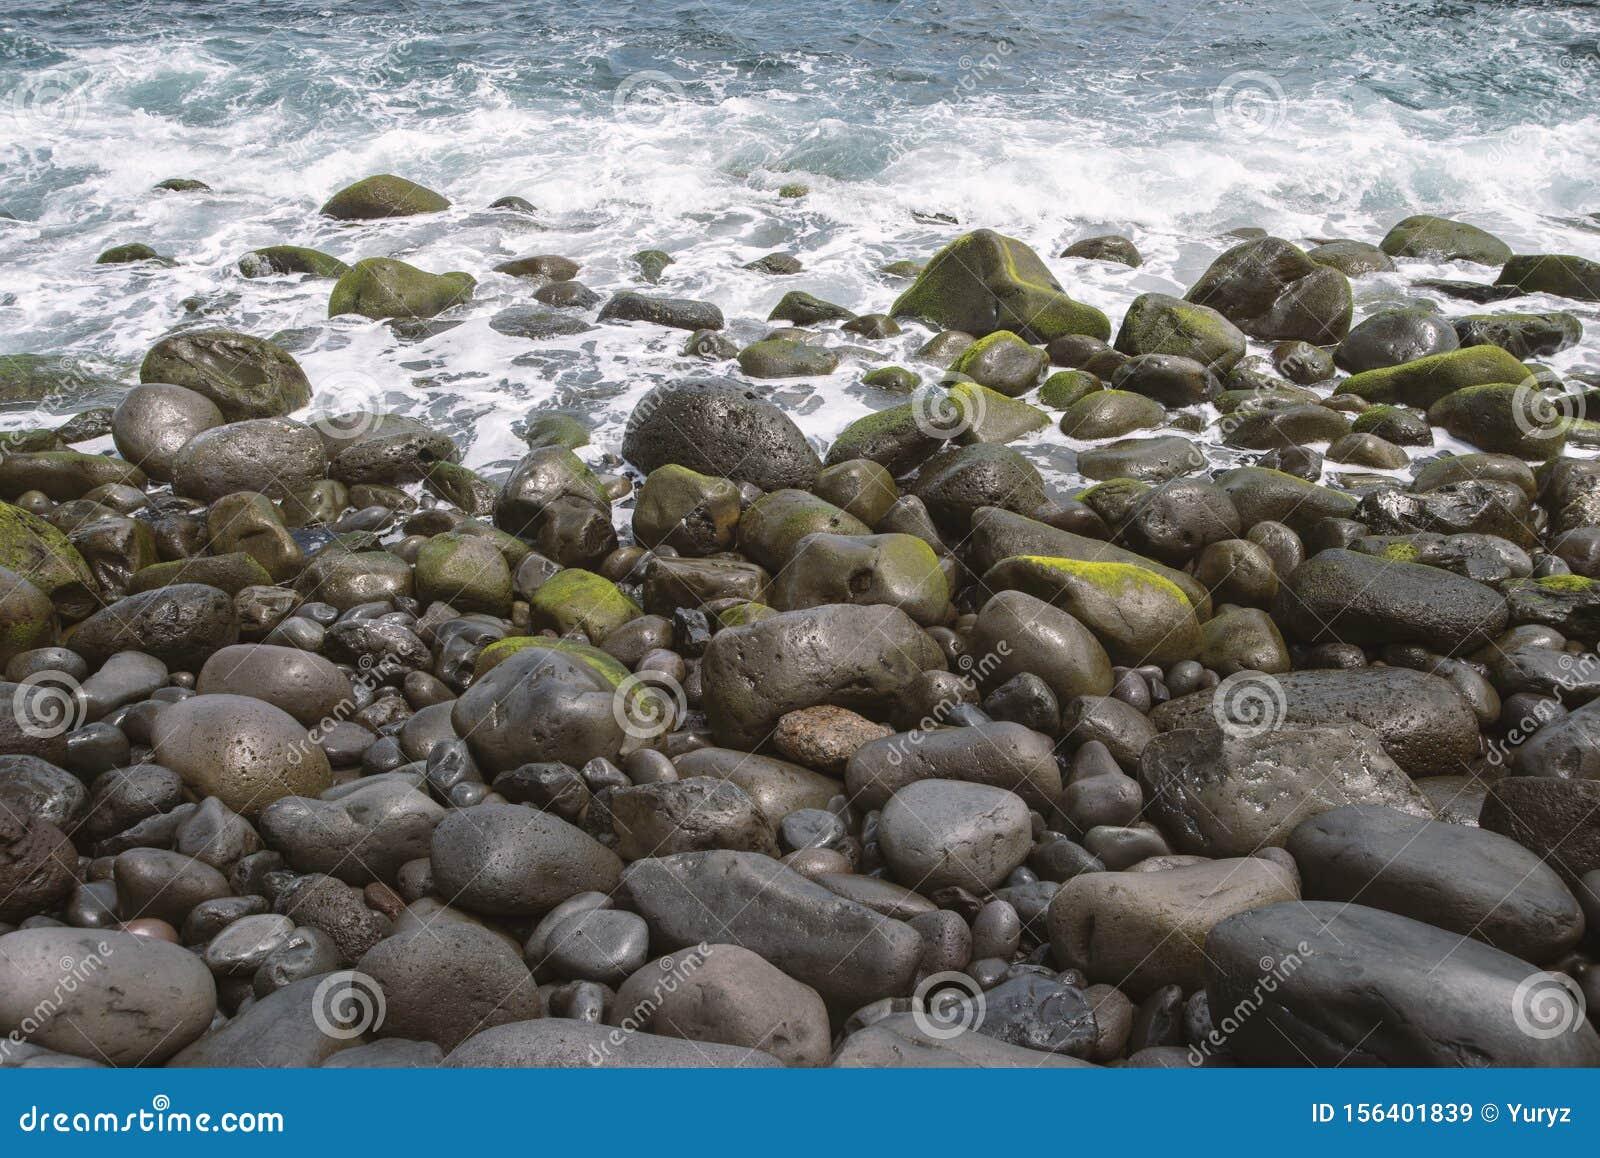 Pebbles ocean shore